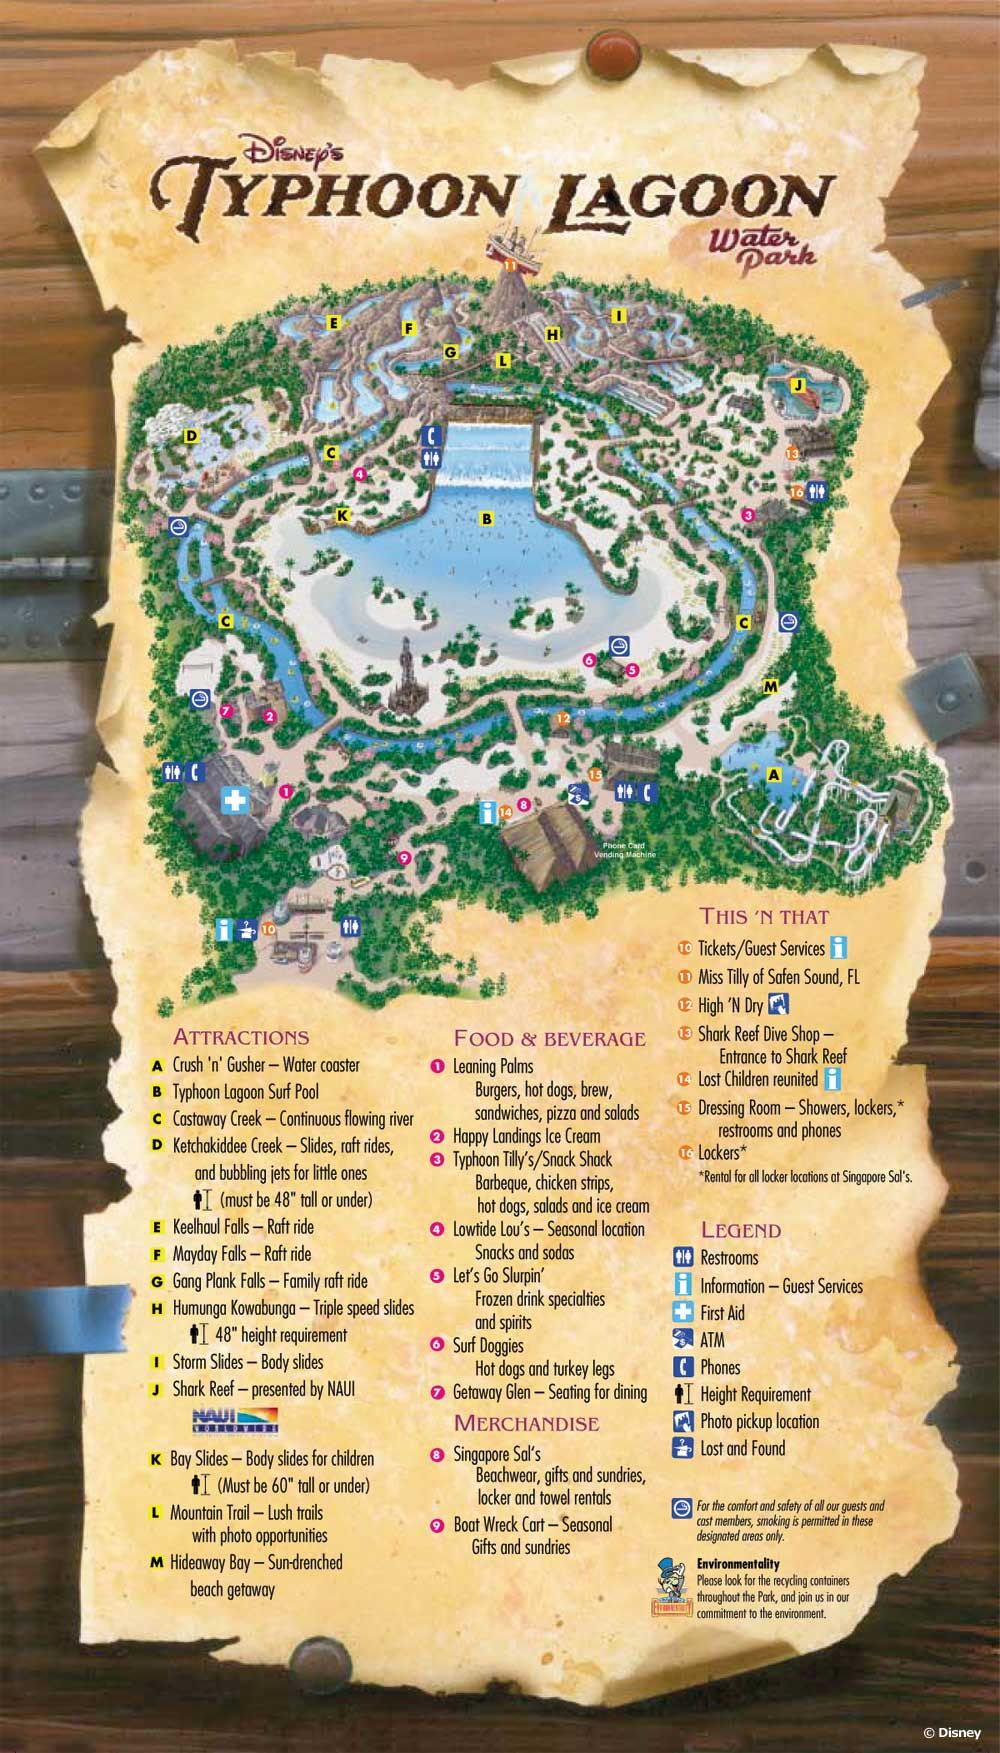 Disneys Typhoon Lagoon Water Park Map Disney Movies Online - Map of us water parks